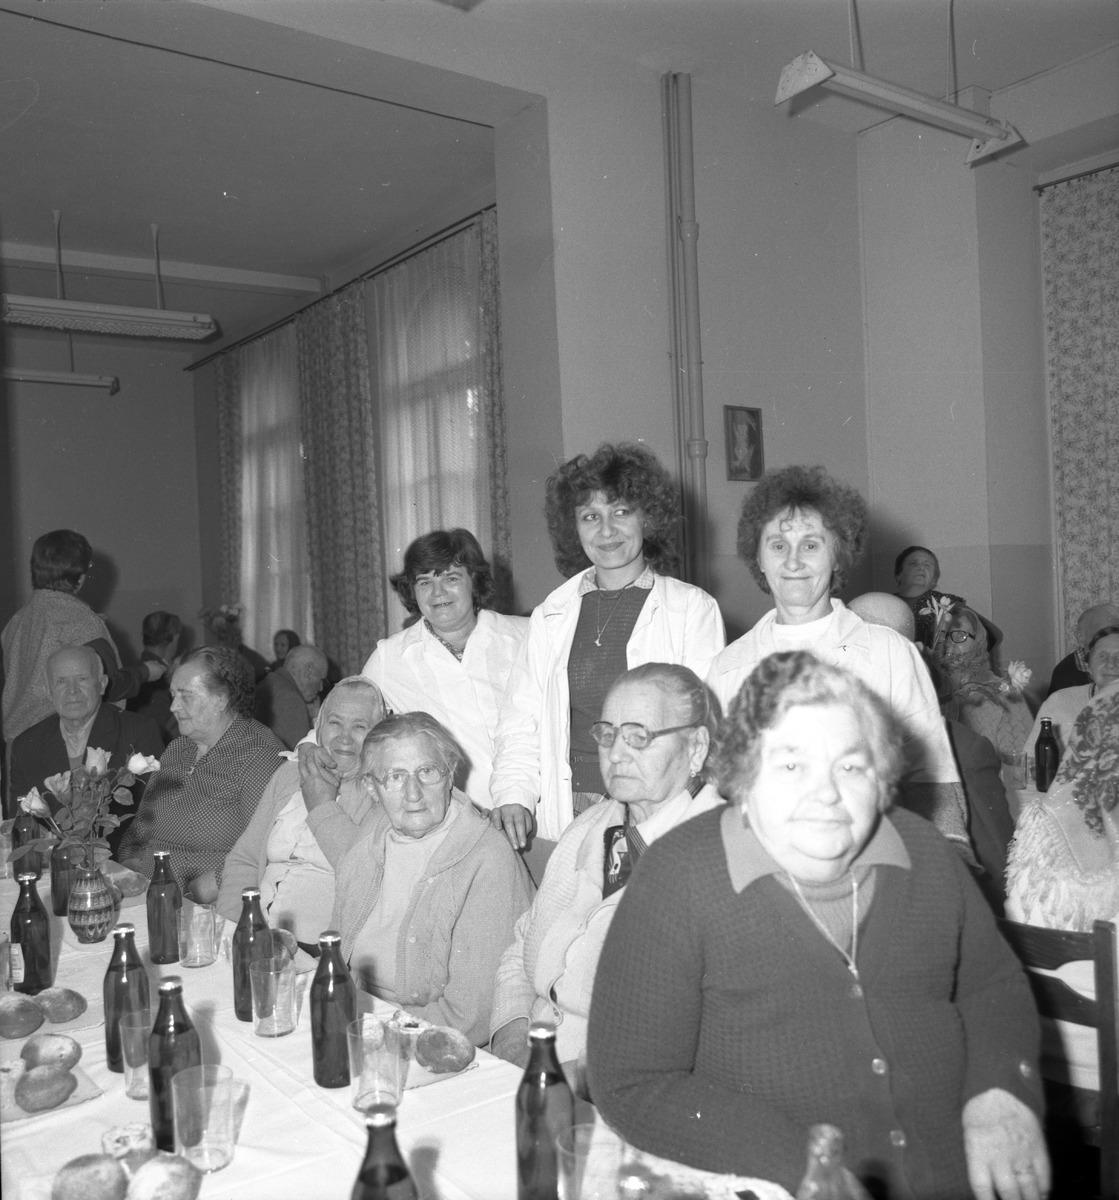 Obchody Dnia Seniora, 1985 r. [9]